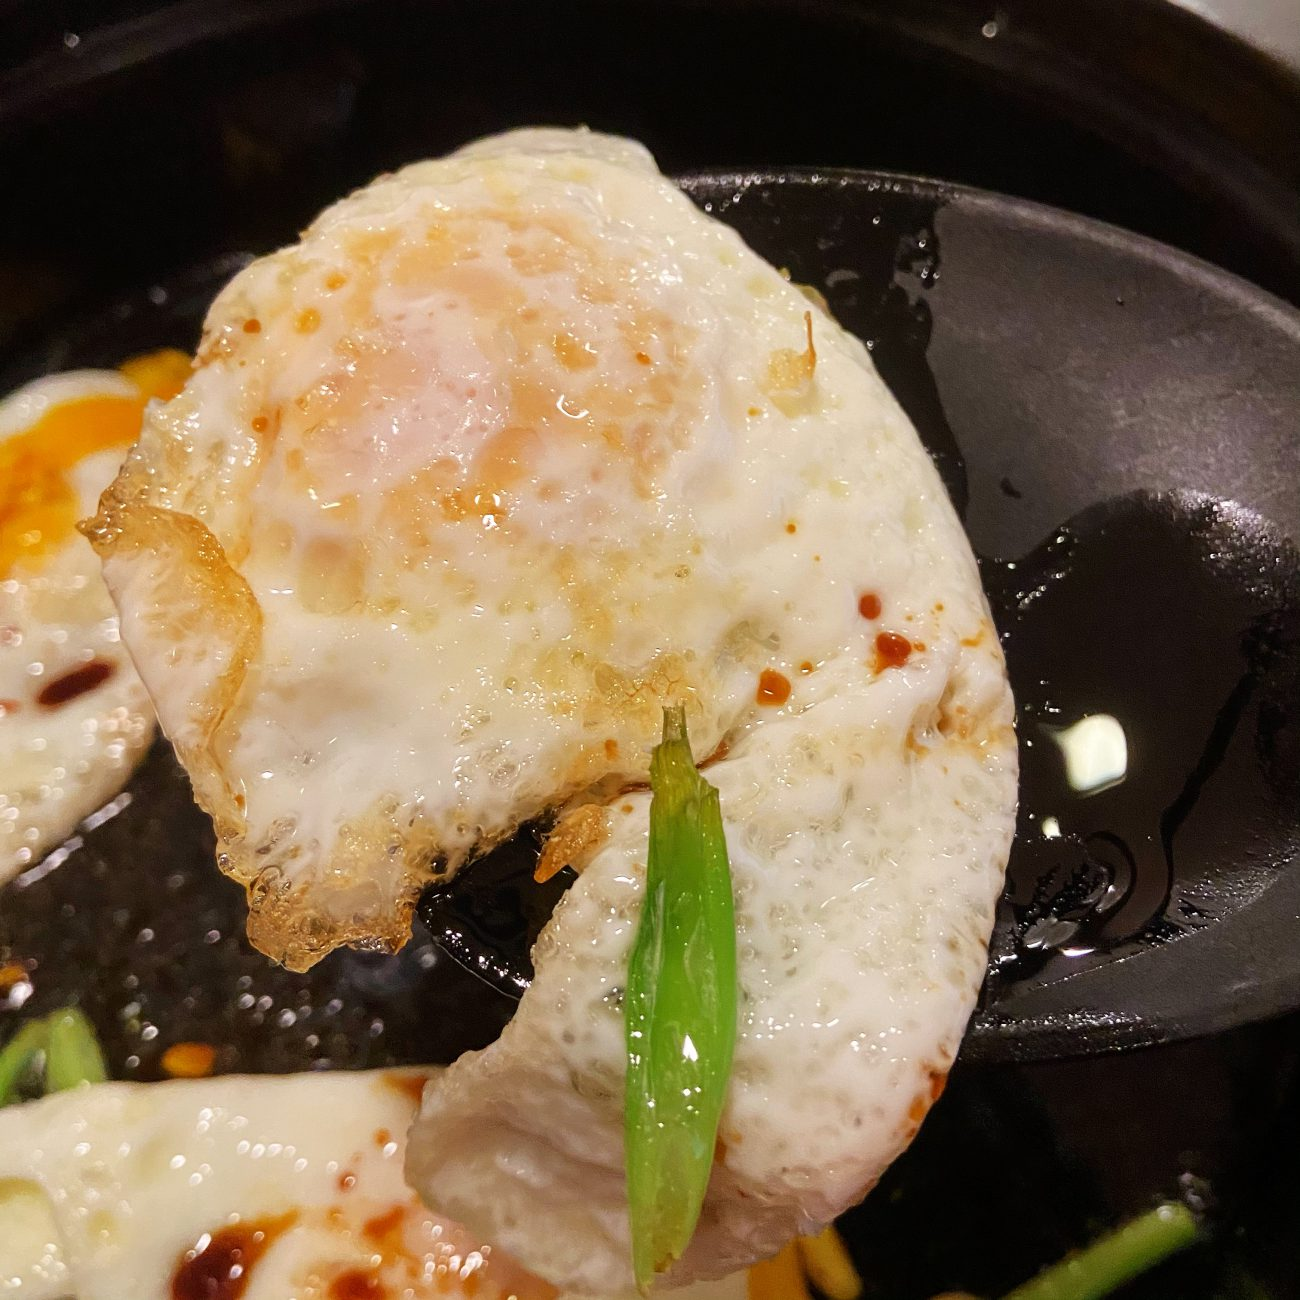 Green Onion fried eggs